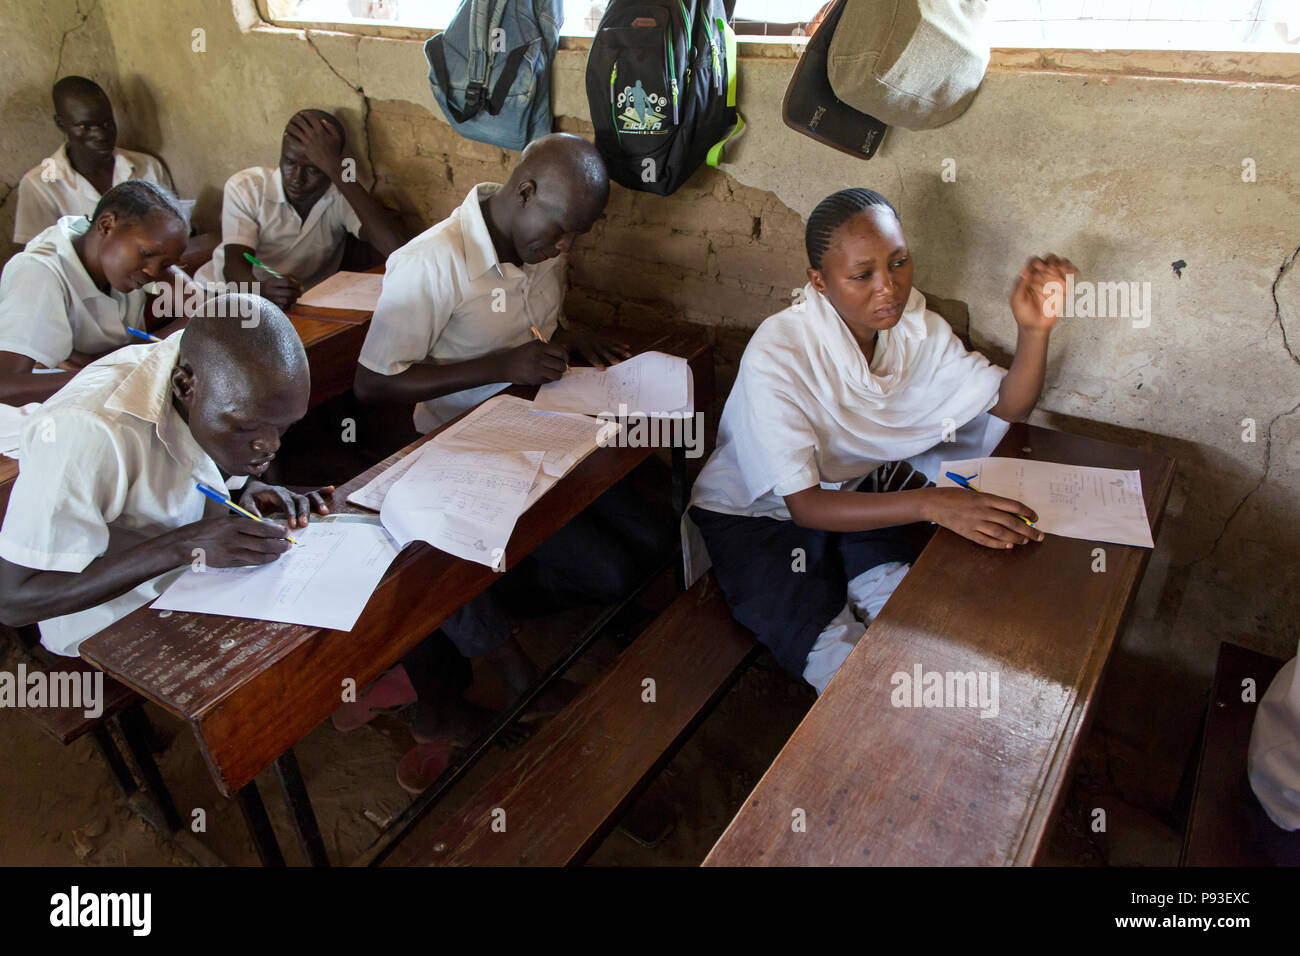 Kakuma, Kenya - Students write exams in a classroom of a school building in the Kakuma refugee camp. - Stock Image